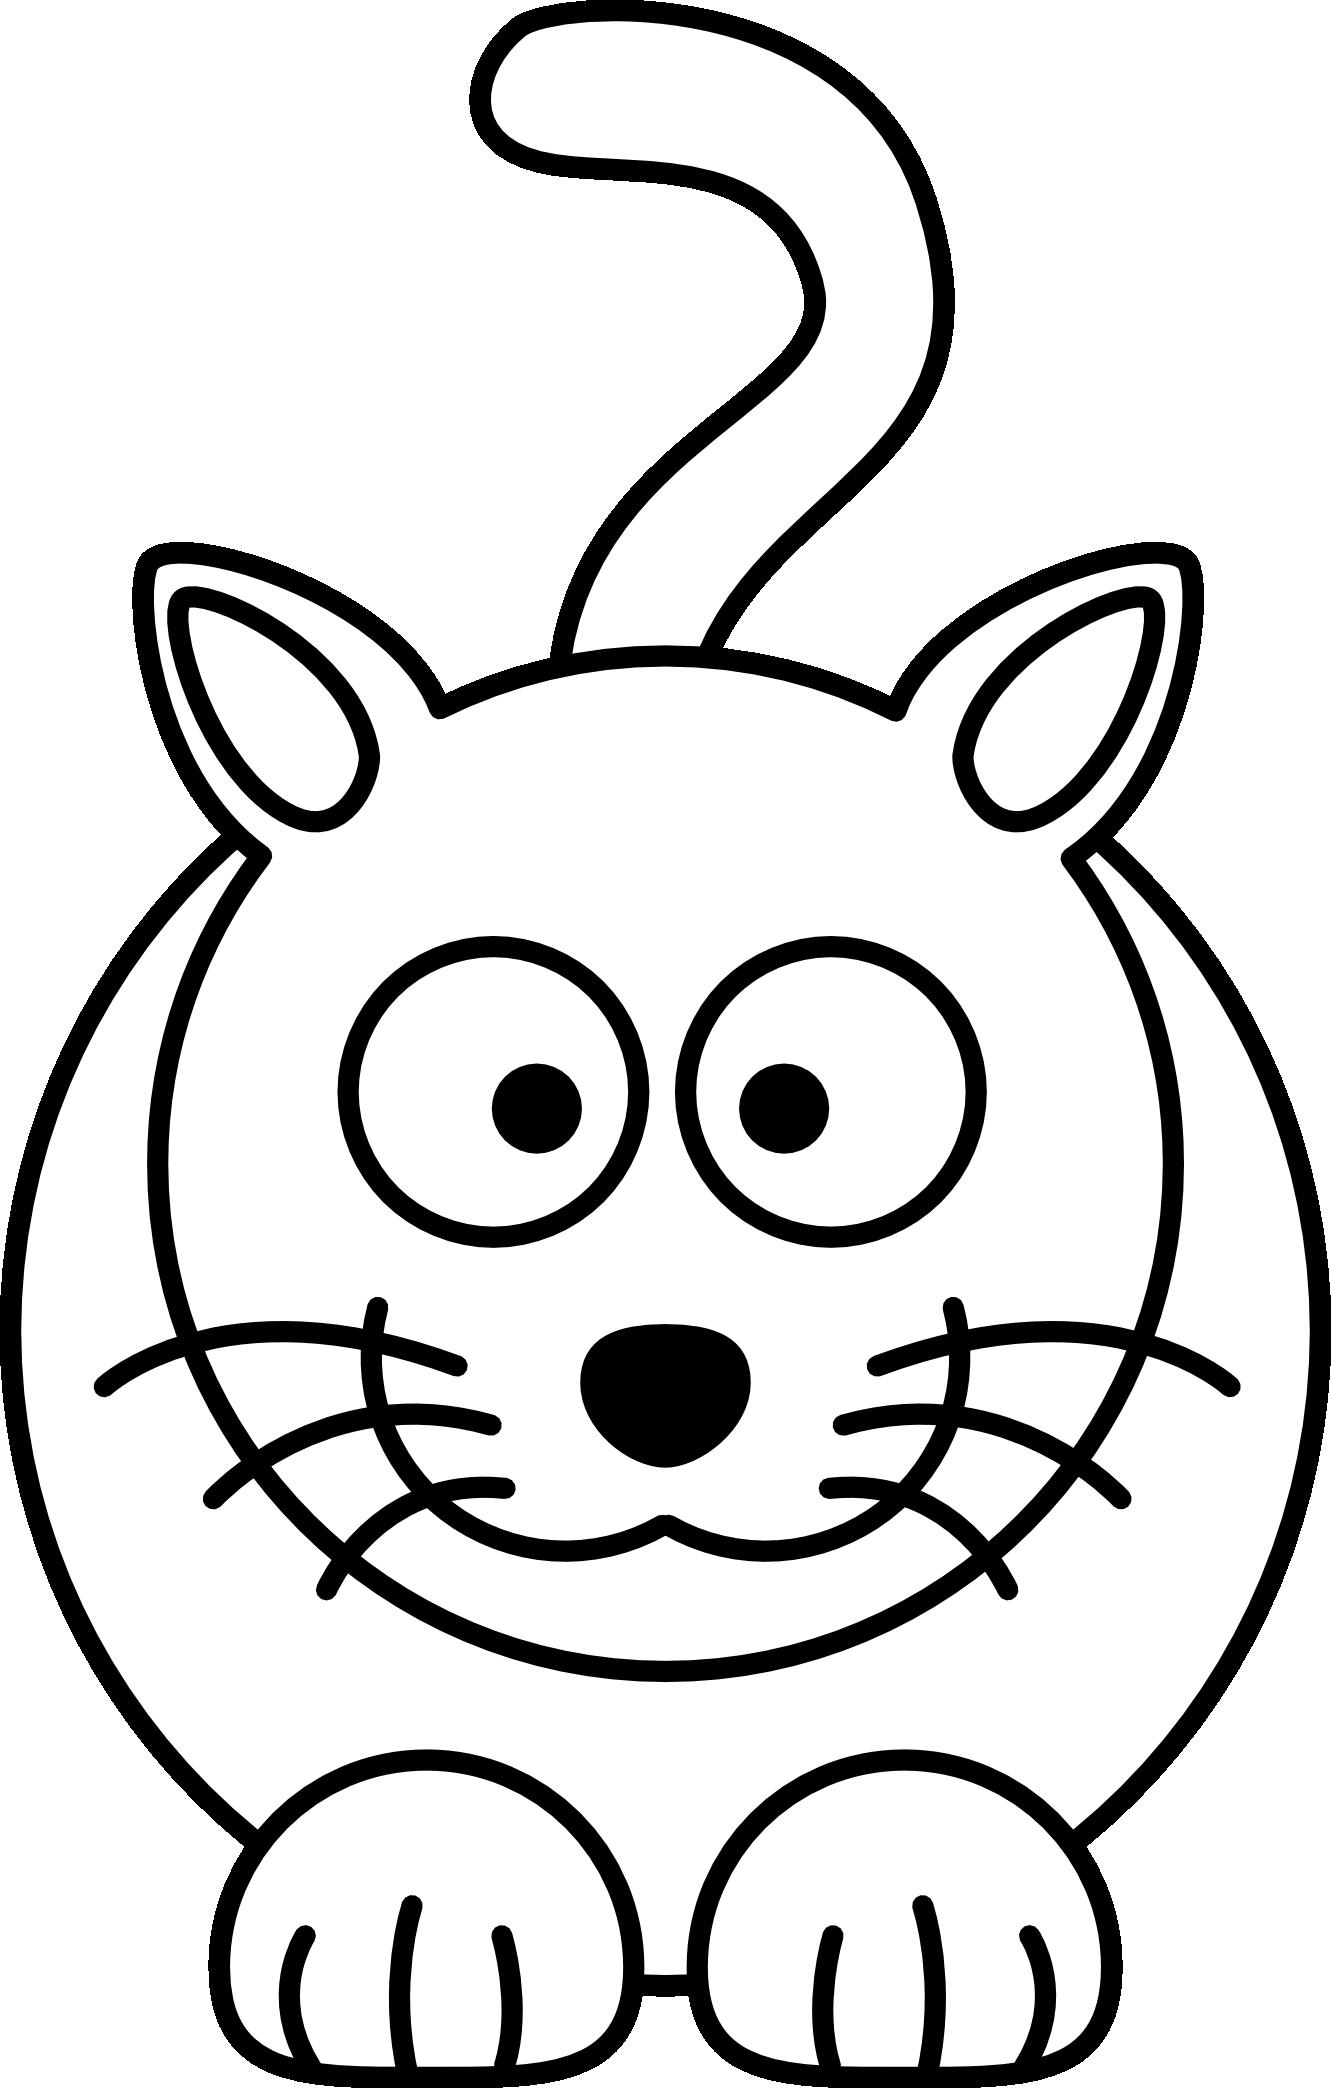 1331x2088 Lemmling Cartoon Cat Black White Line Art Coloring Book Colouring